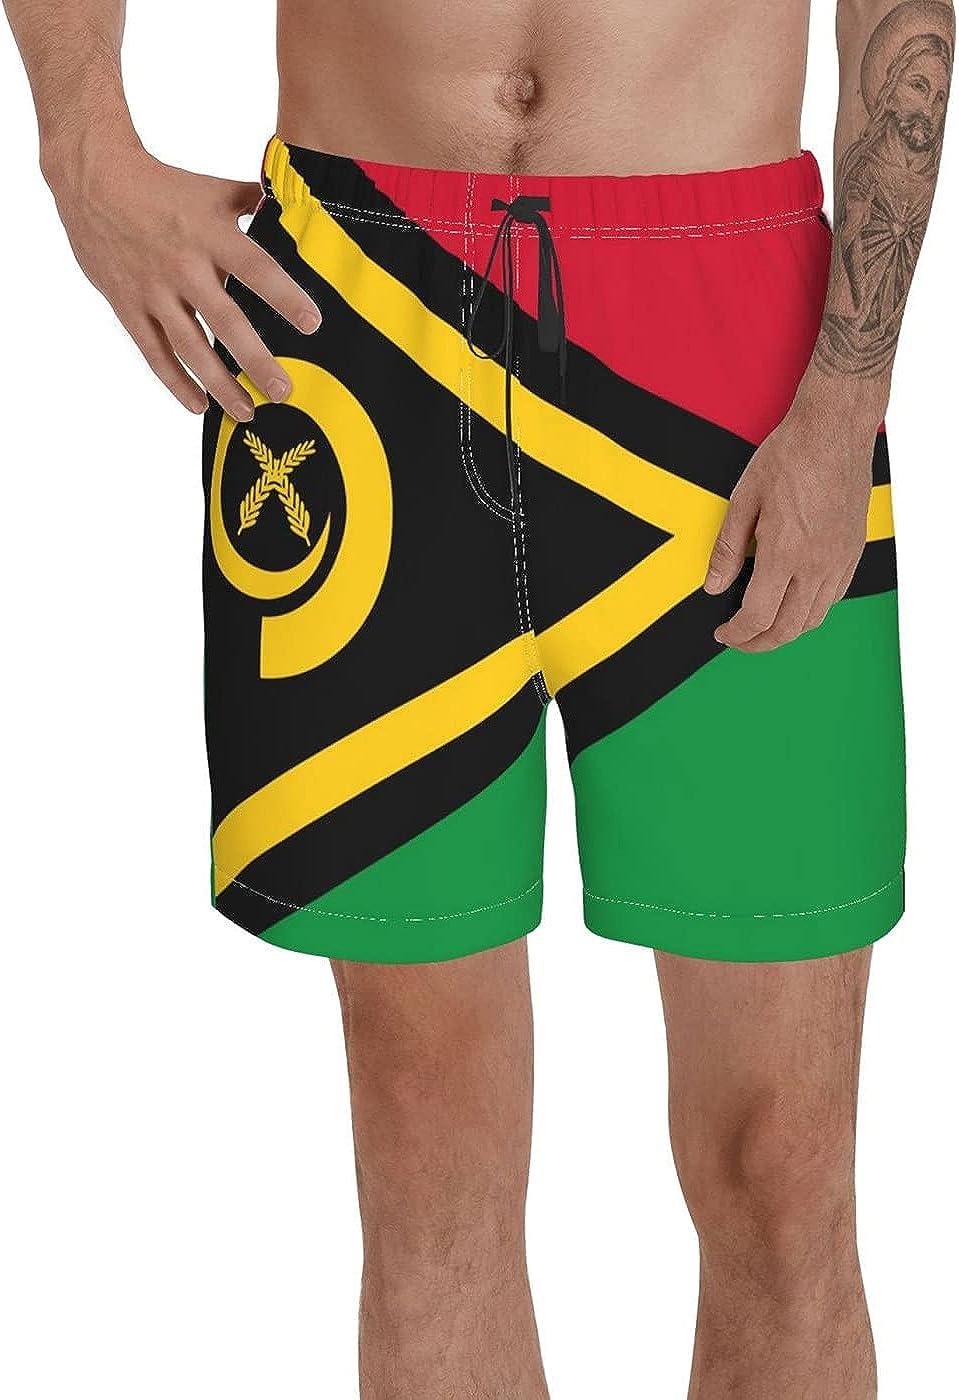 Count Vanuatu Flag Men's 3D Printed Funny Summer Quick Dry Swim Short Board Shorts with